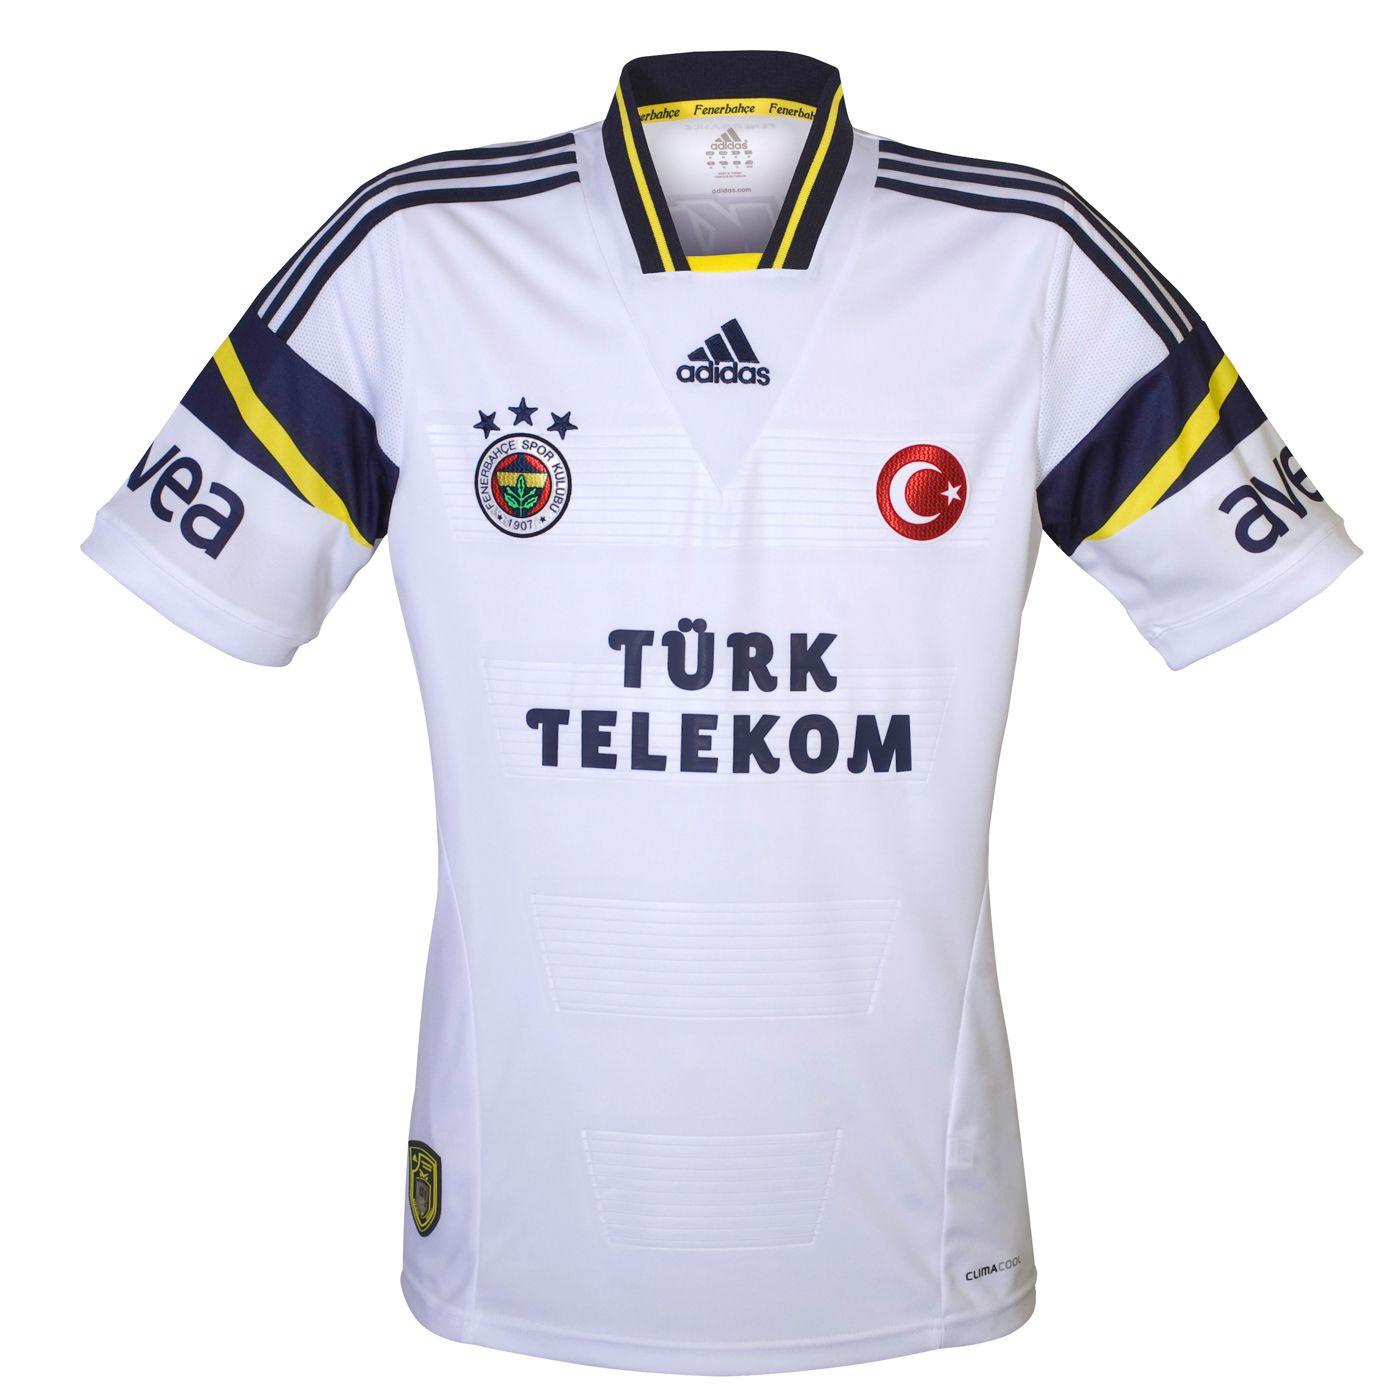 aa6e8b7df Fenerbahçe SK (Turkey) - 2013 2014 Adidas Third Shirt